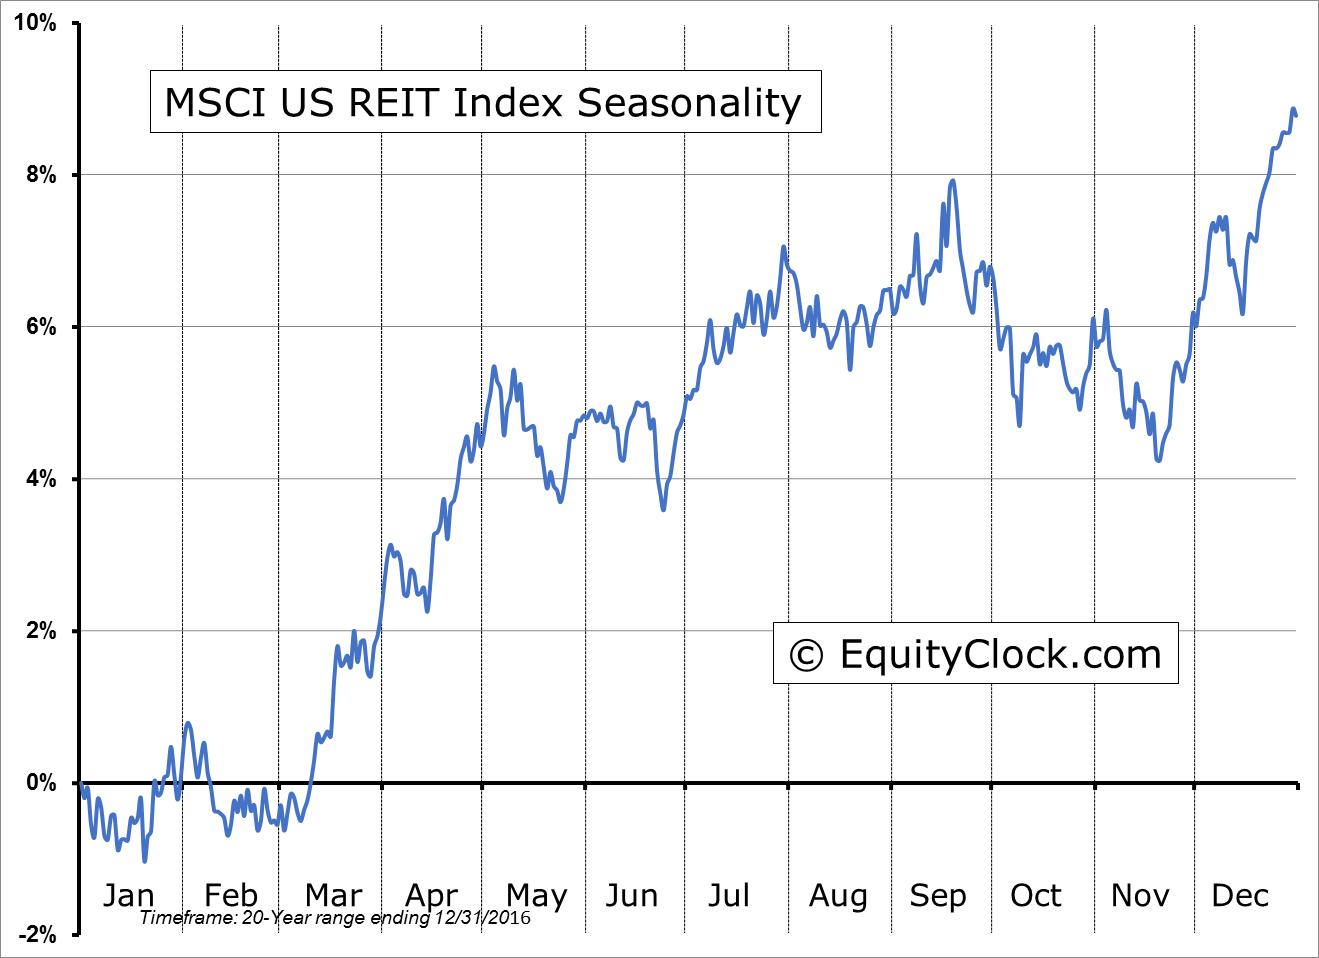 MSCI US REIT Index Seasonality